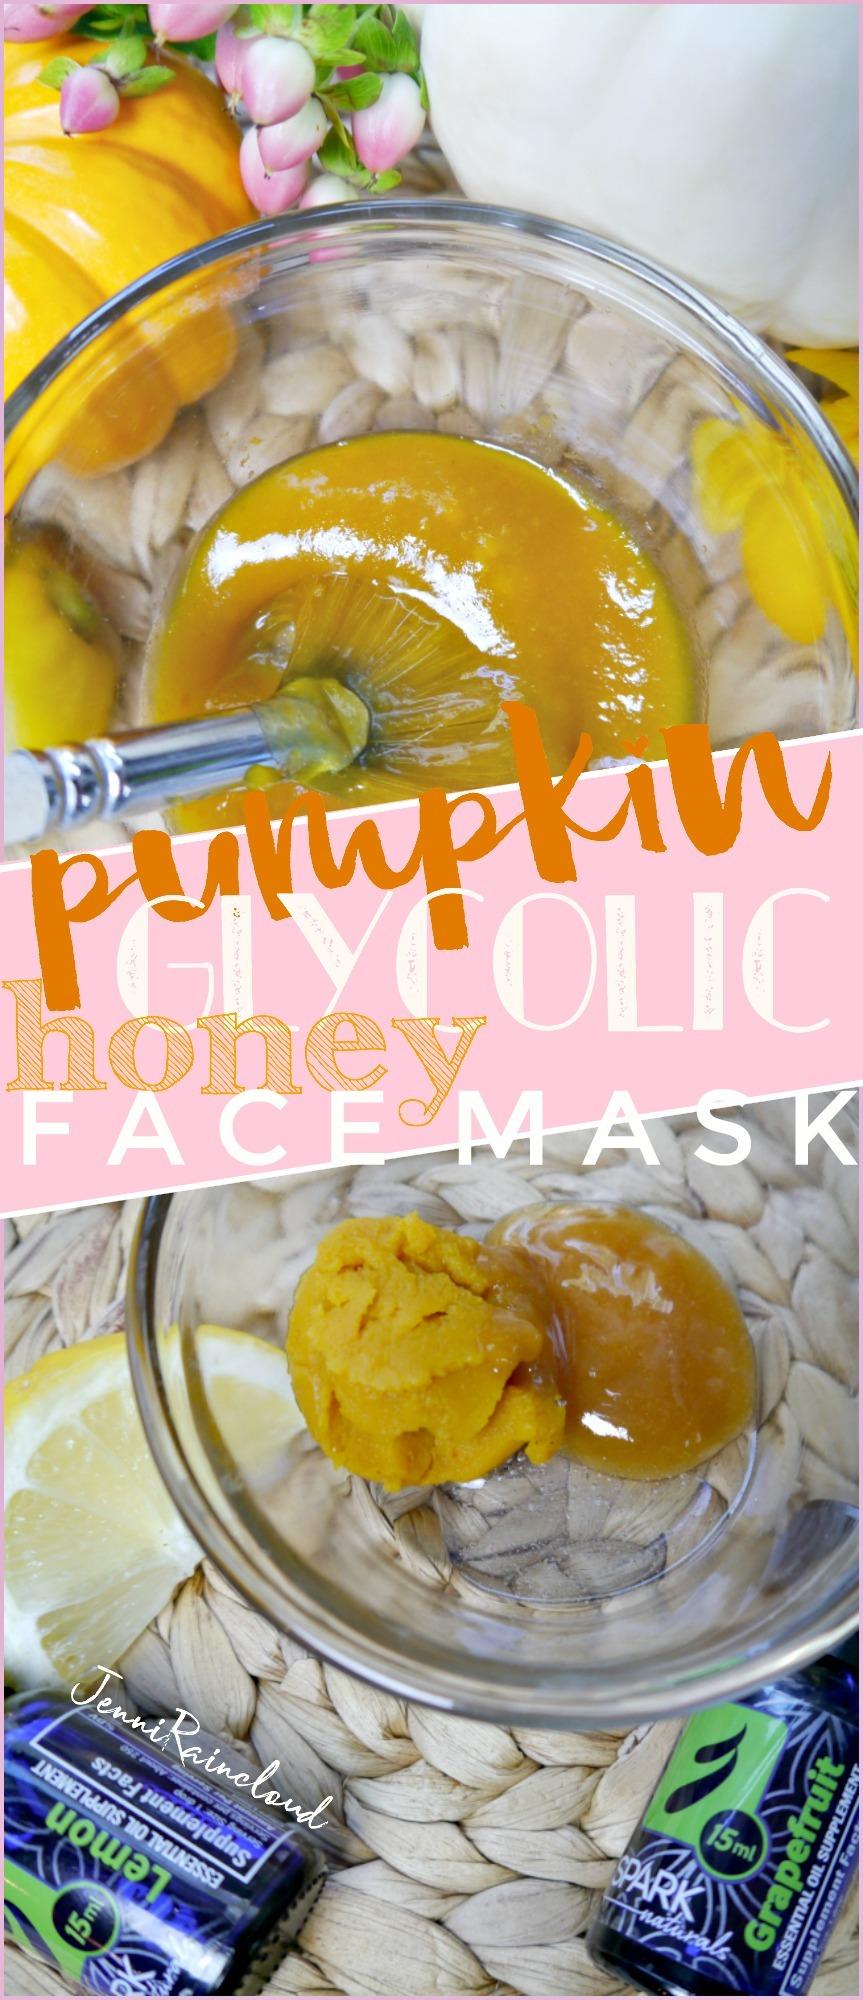 DIY Pumpkin Glycolic Honey Mask